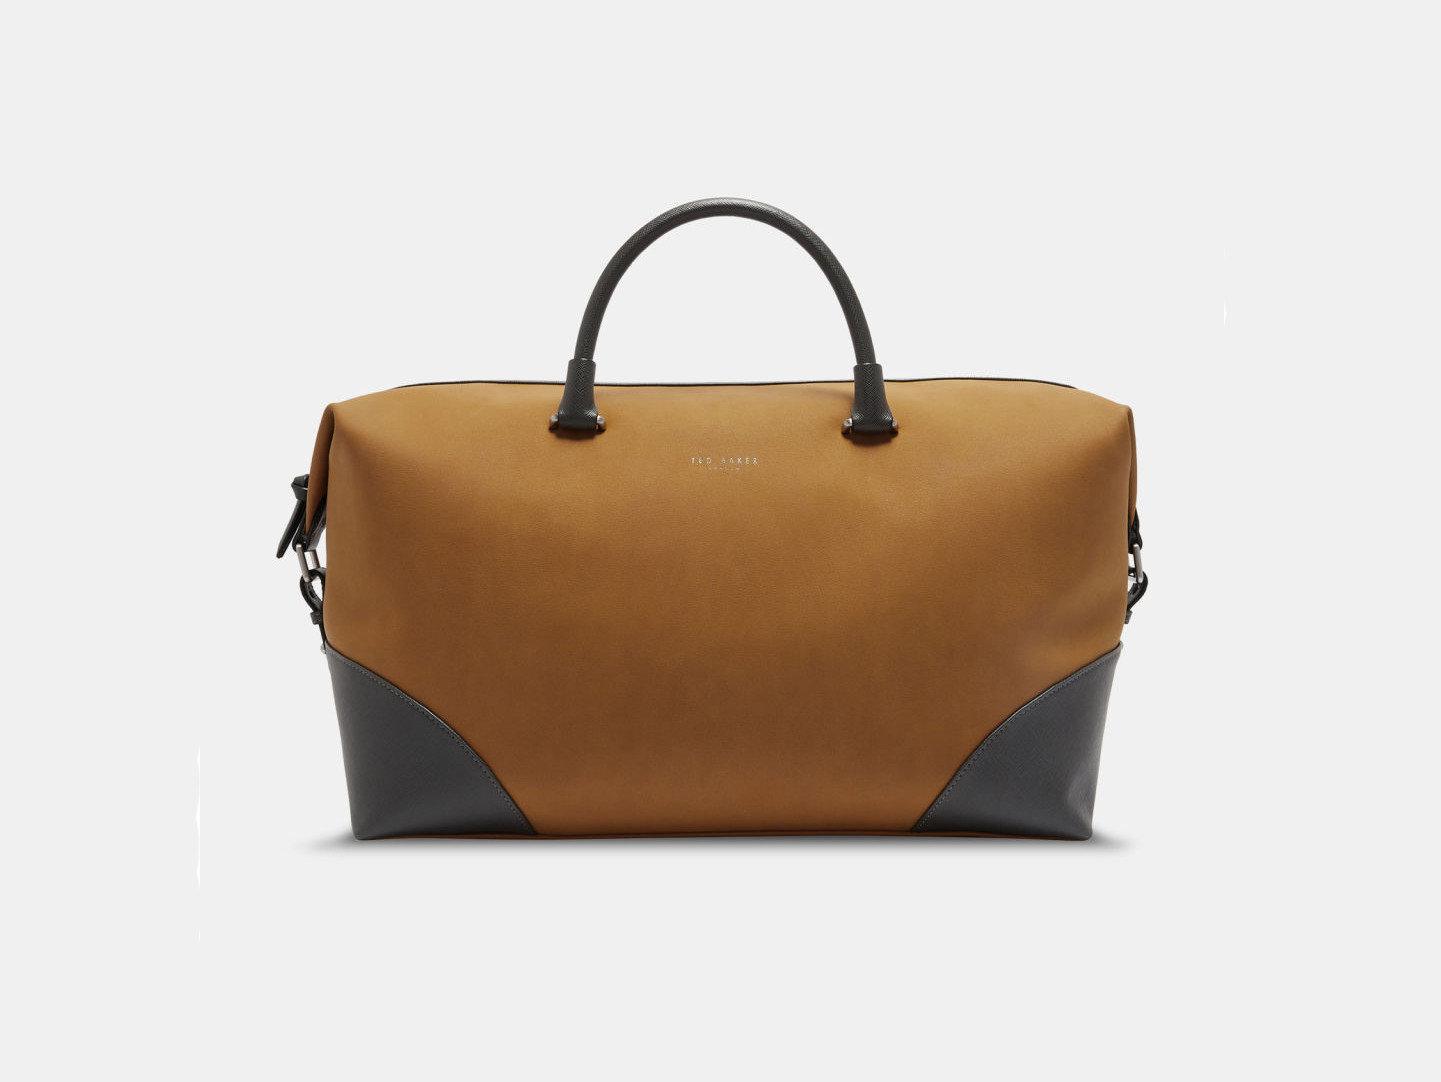 Style + Design Travel Shop bag brown handbag accessory leather fashion accessory product case shoulder bag product design brand caramel color baggage beige